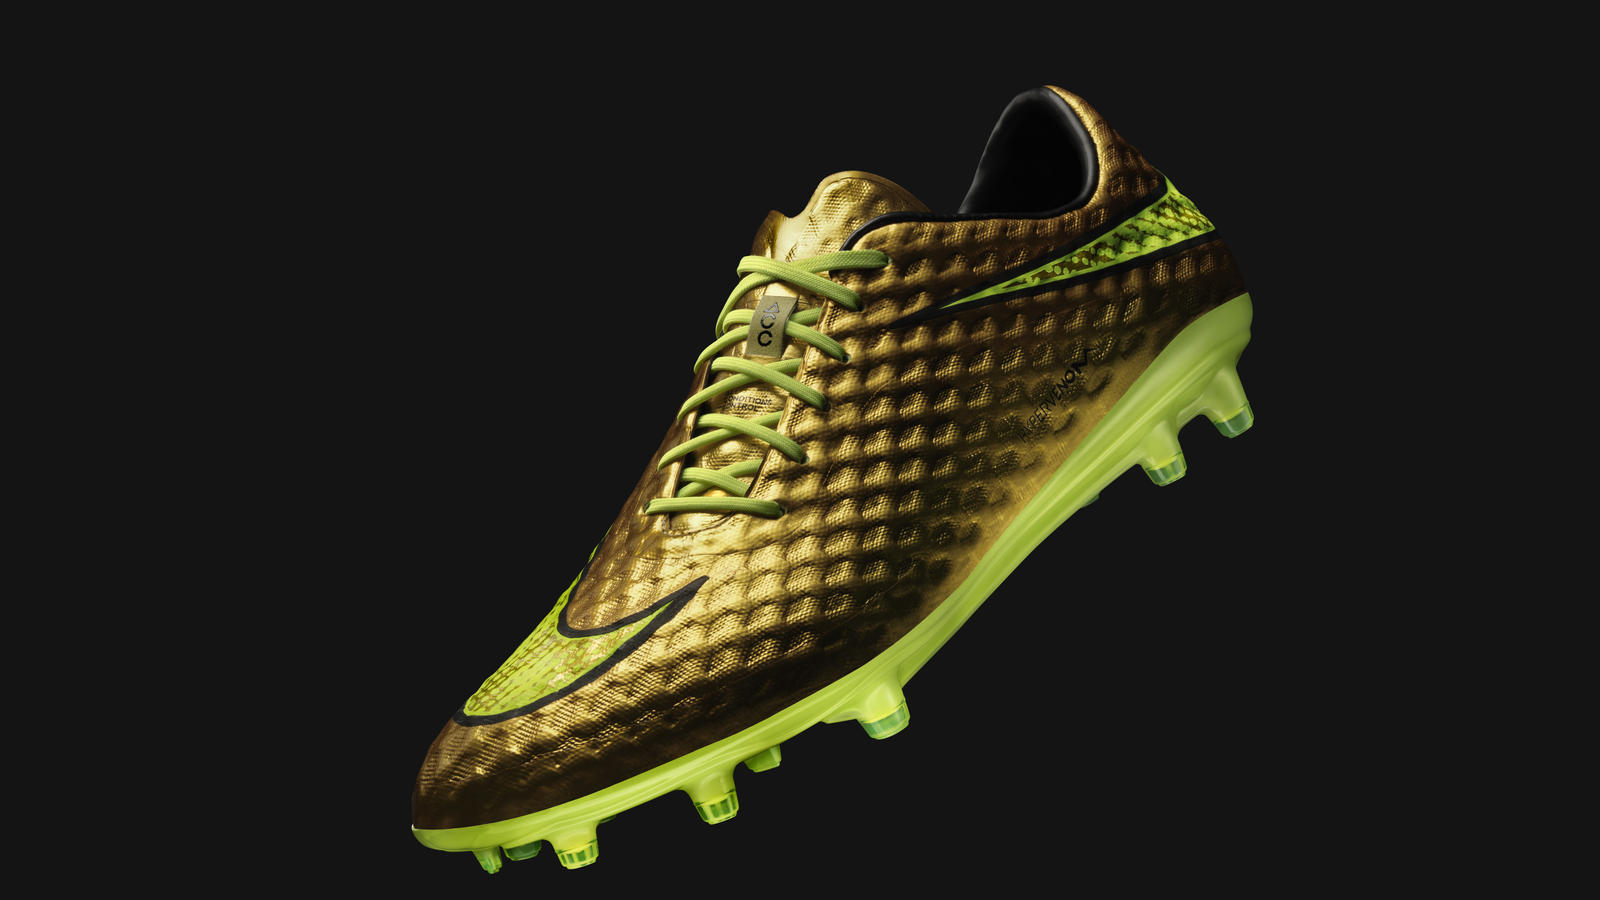 grand choix de d249d 8b805 Neymar Jr. and Nike Introduce Gold Hypervenom Special ...